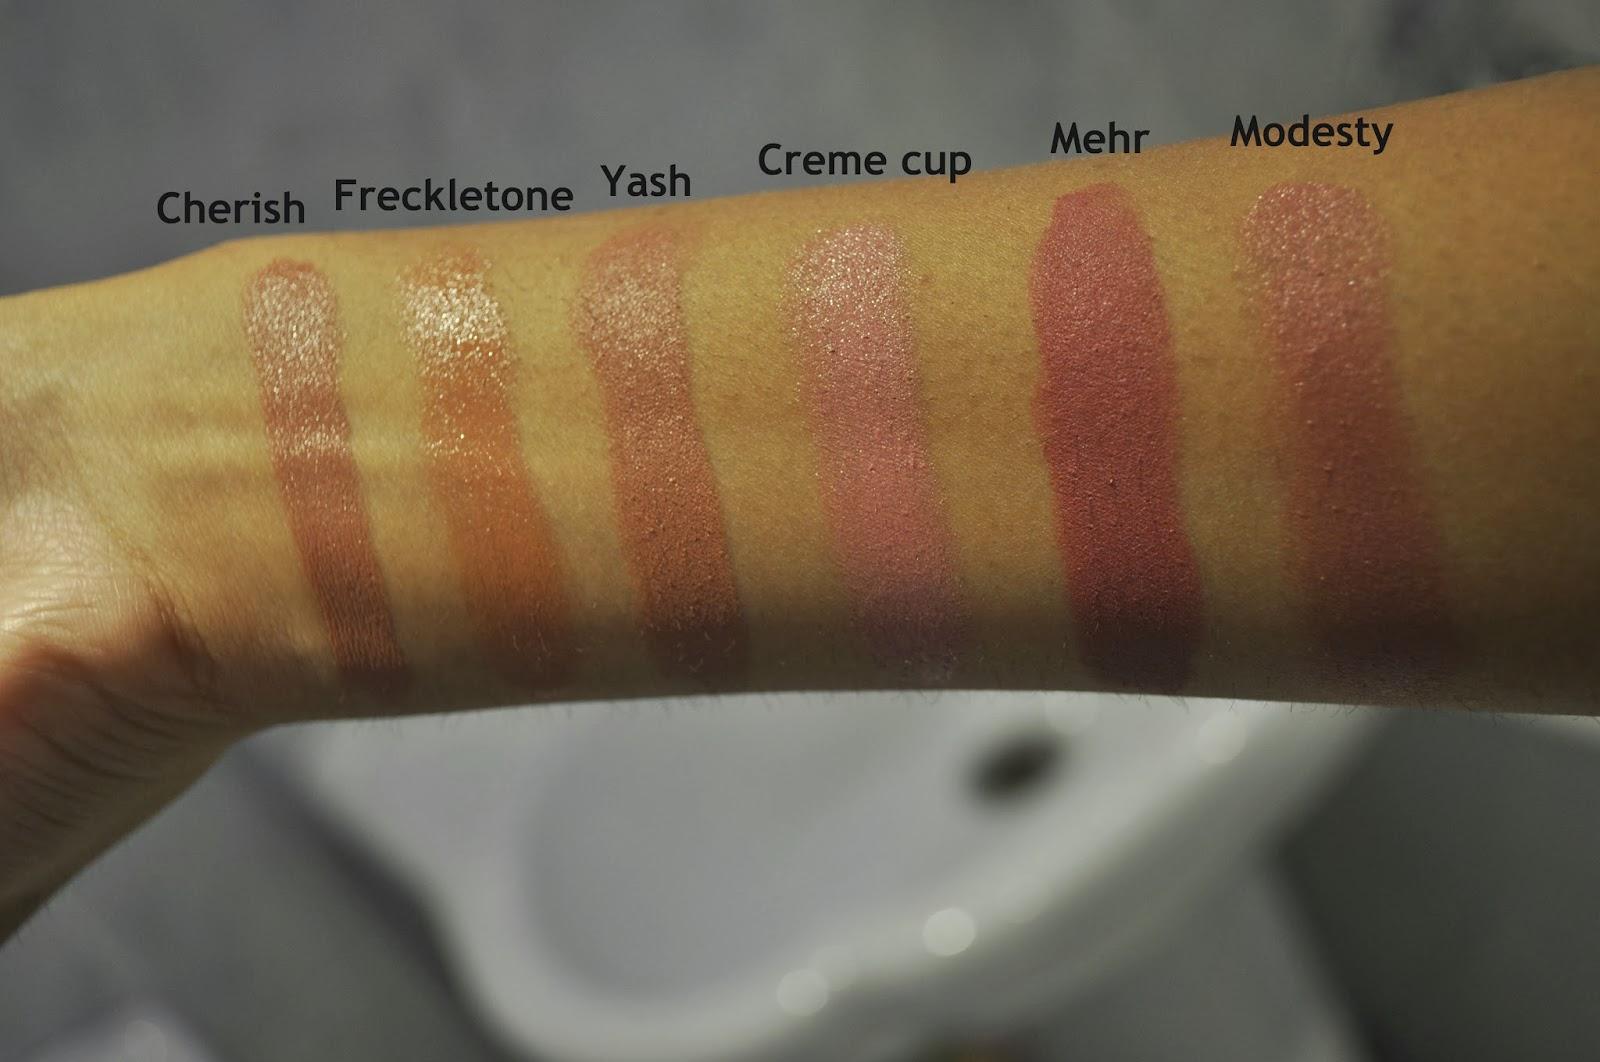 Bekend Bittersweet : MAC Nude/Pale Pink Lipsticks for Tan Skin Tones XH81